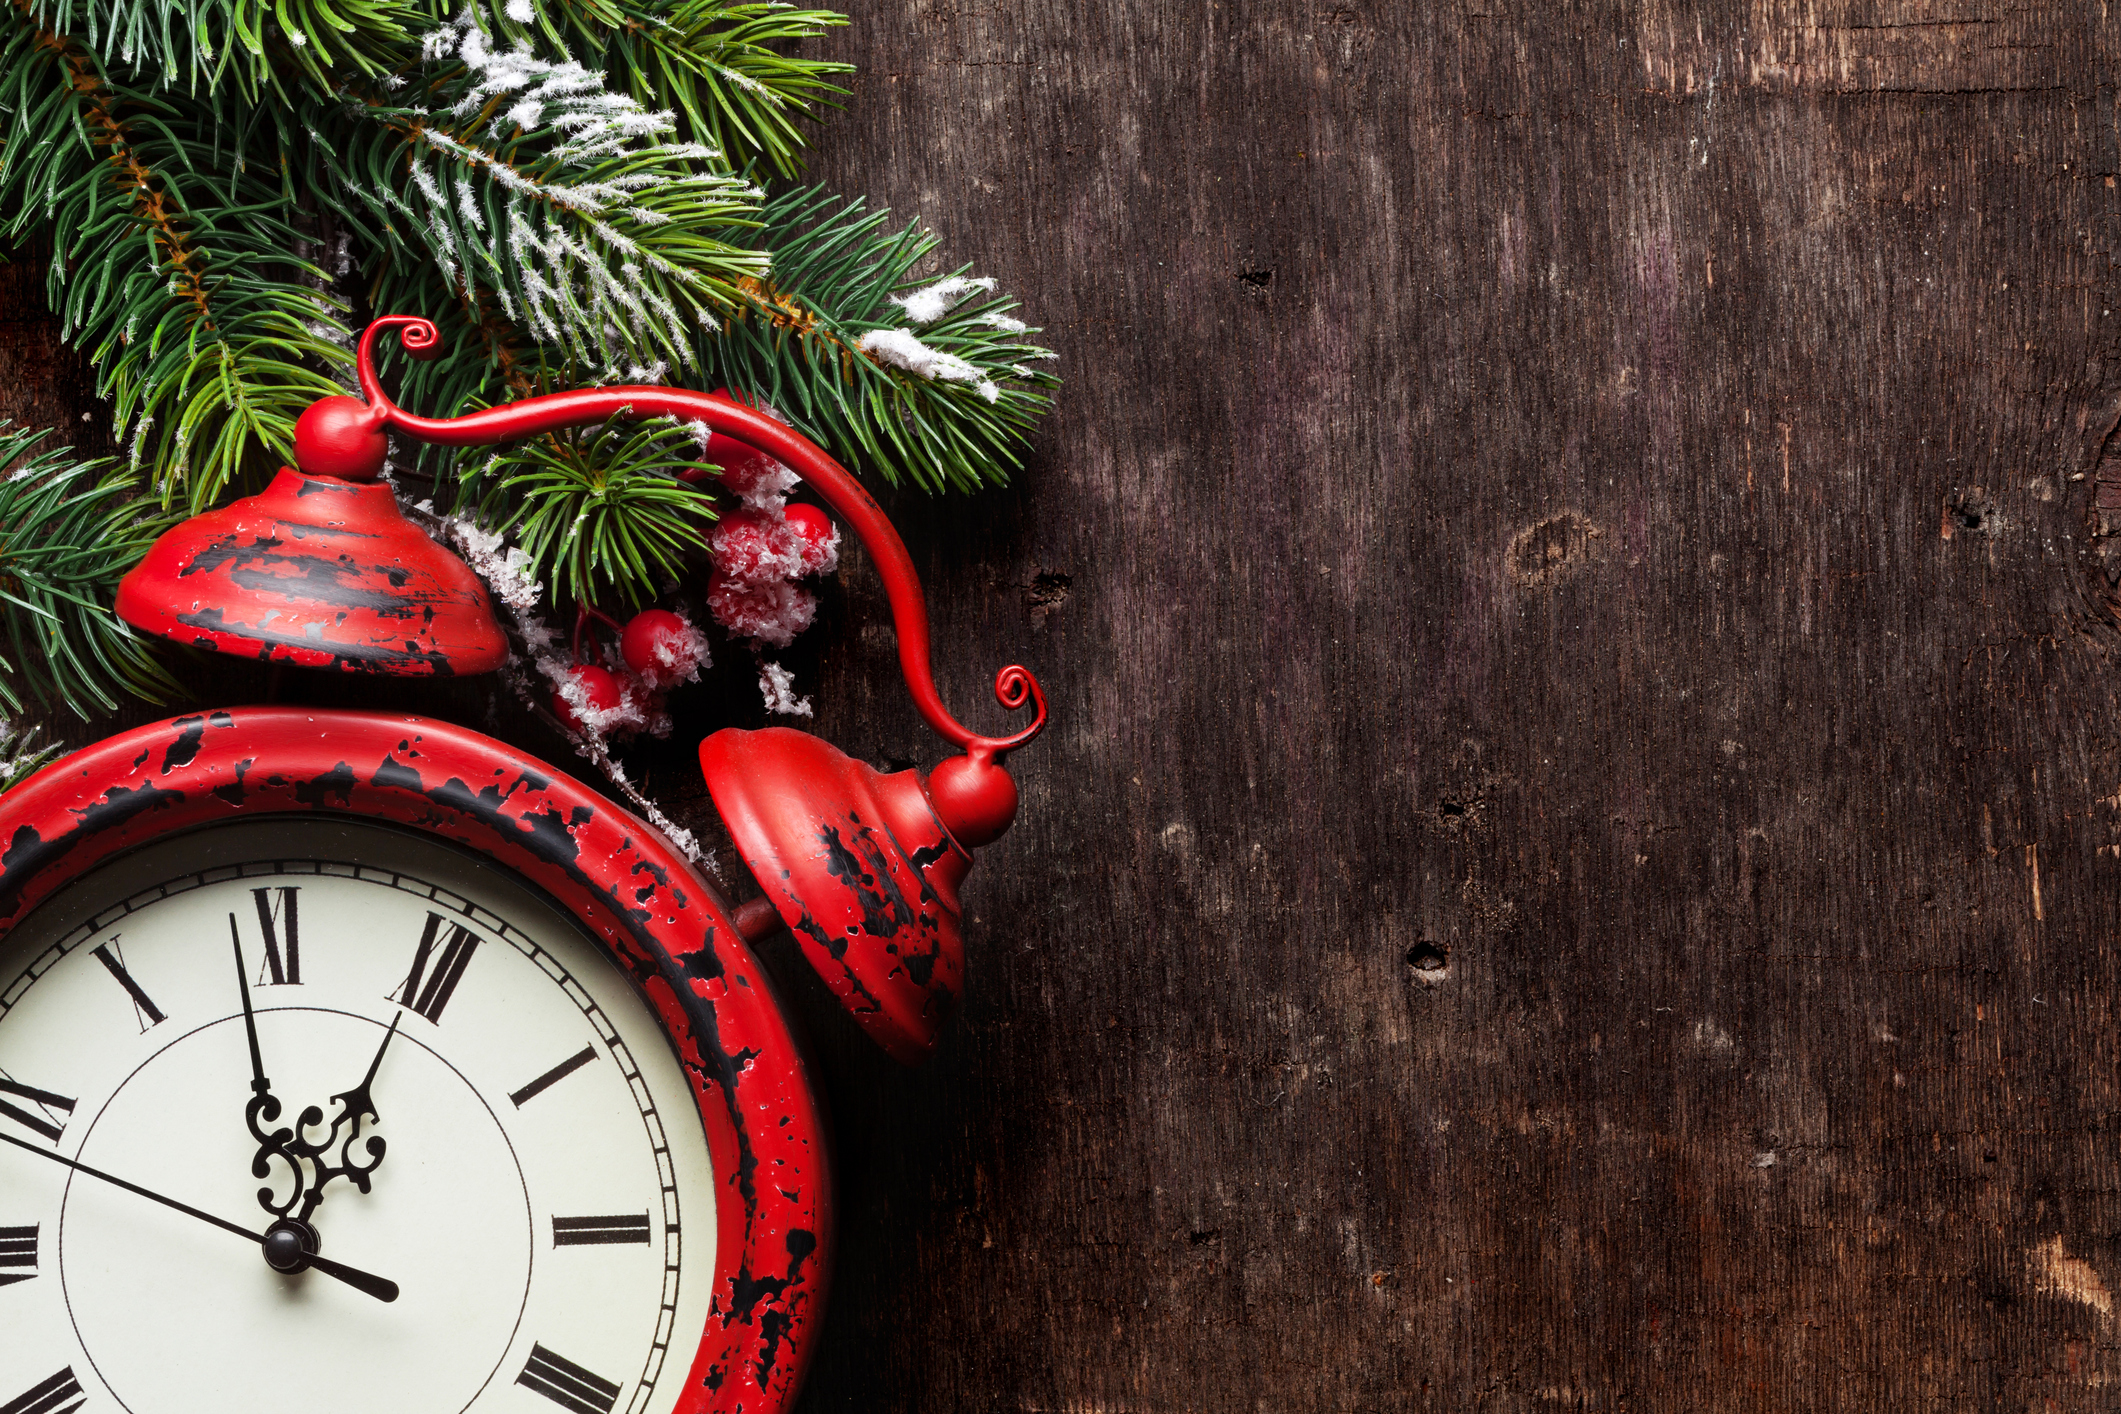 Christmas fir tree and alarm clock